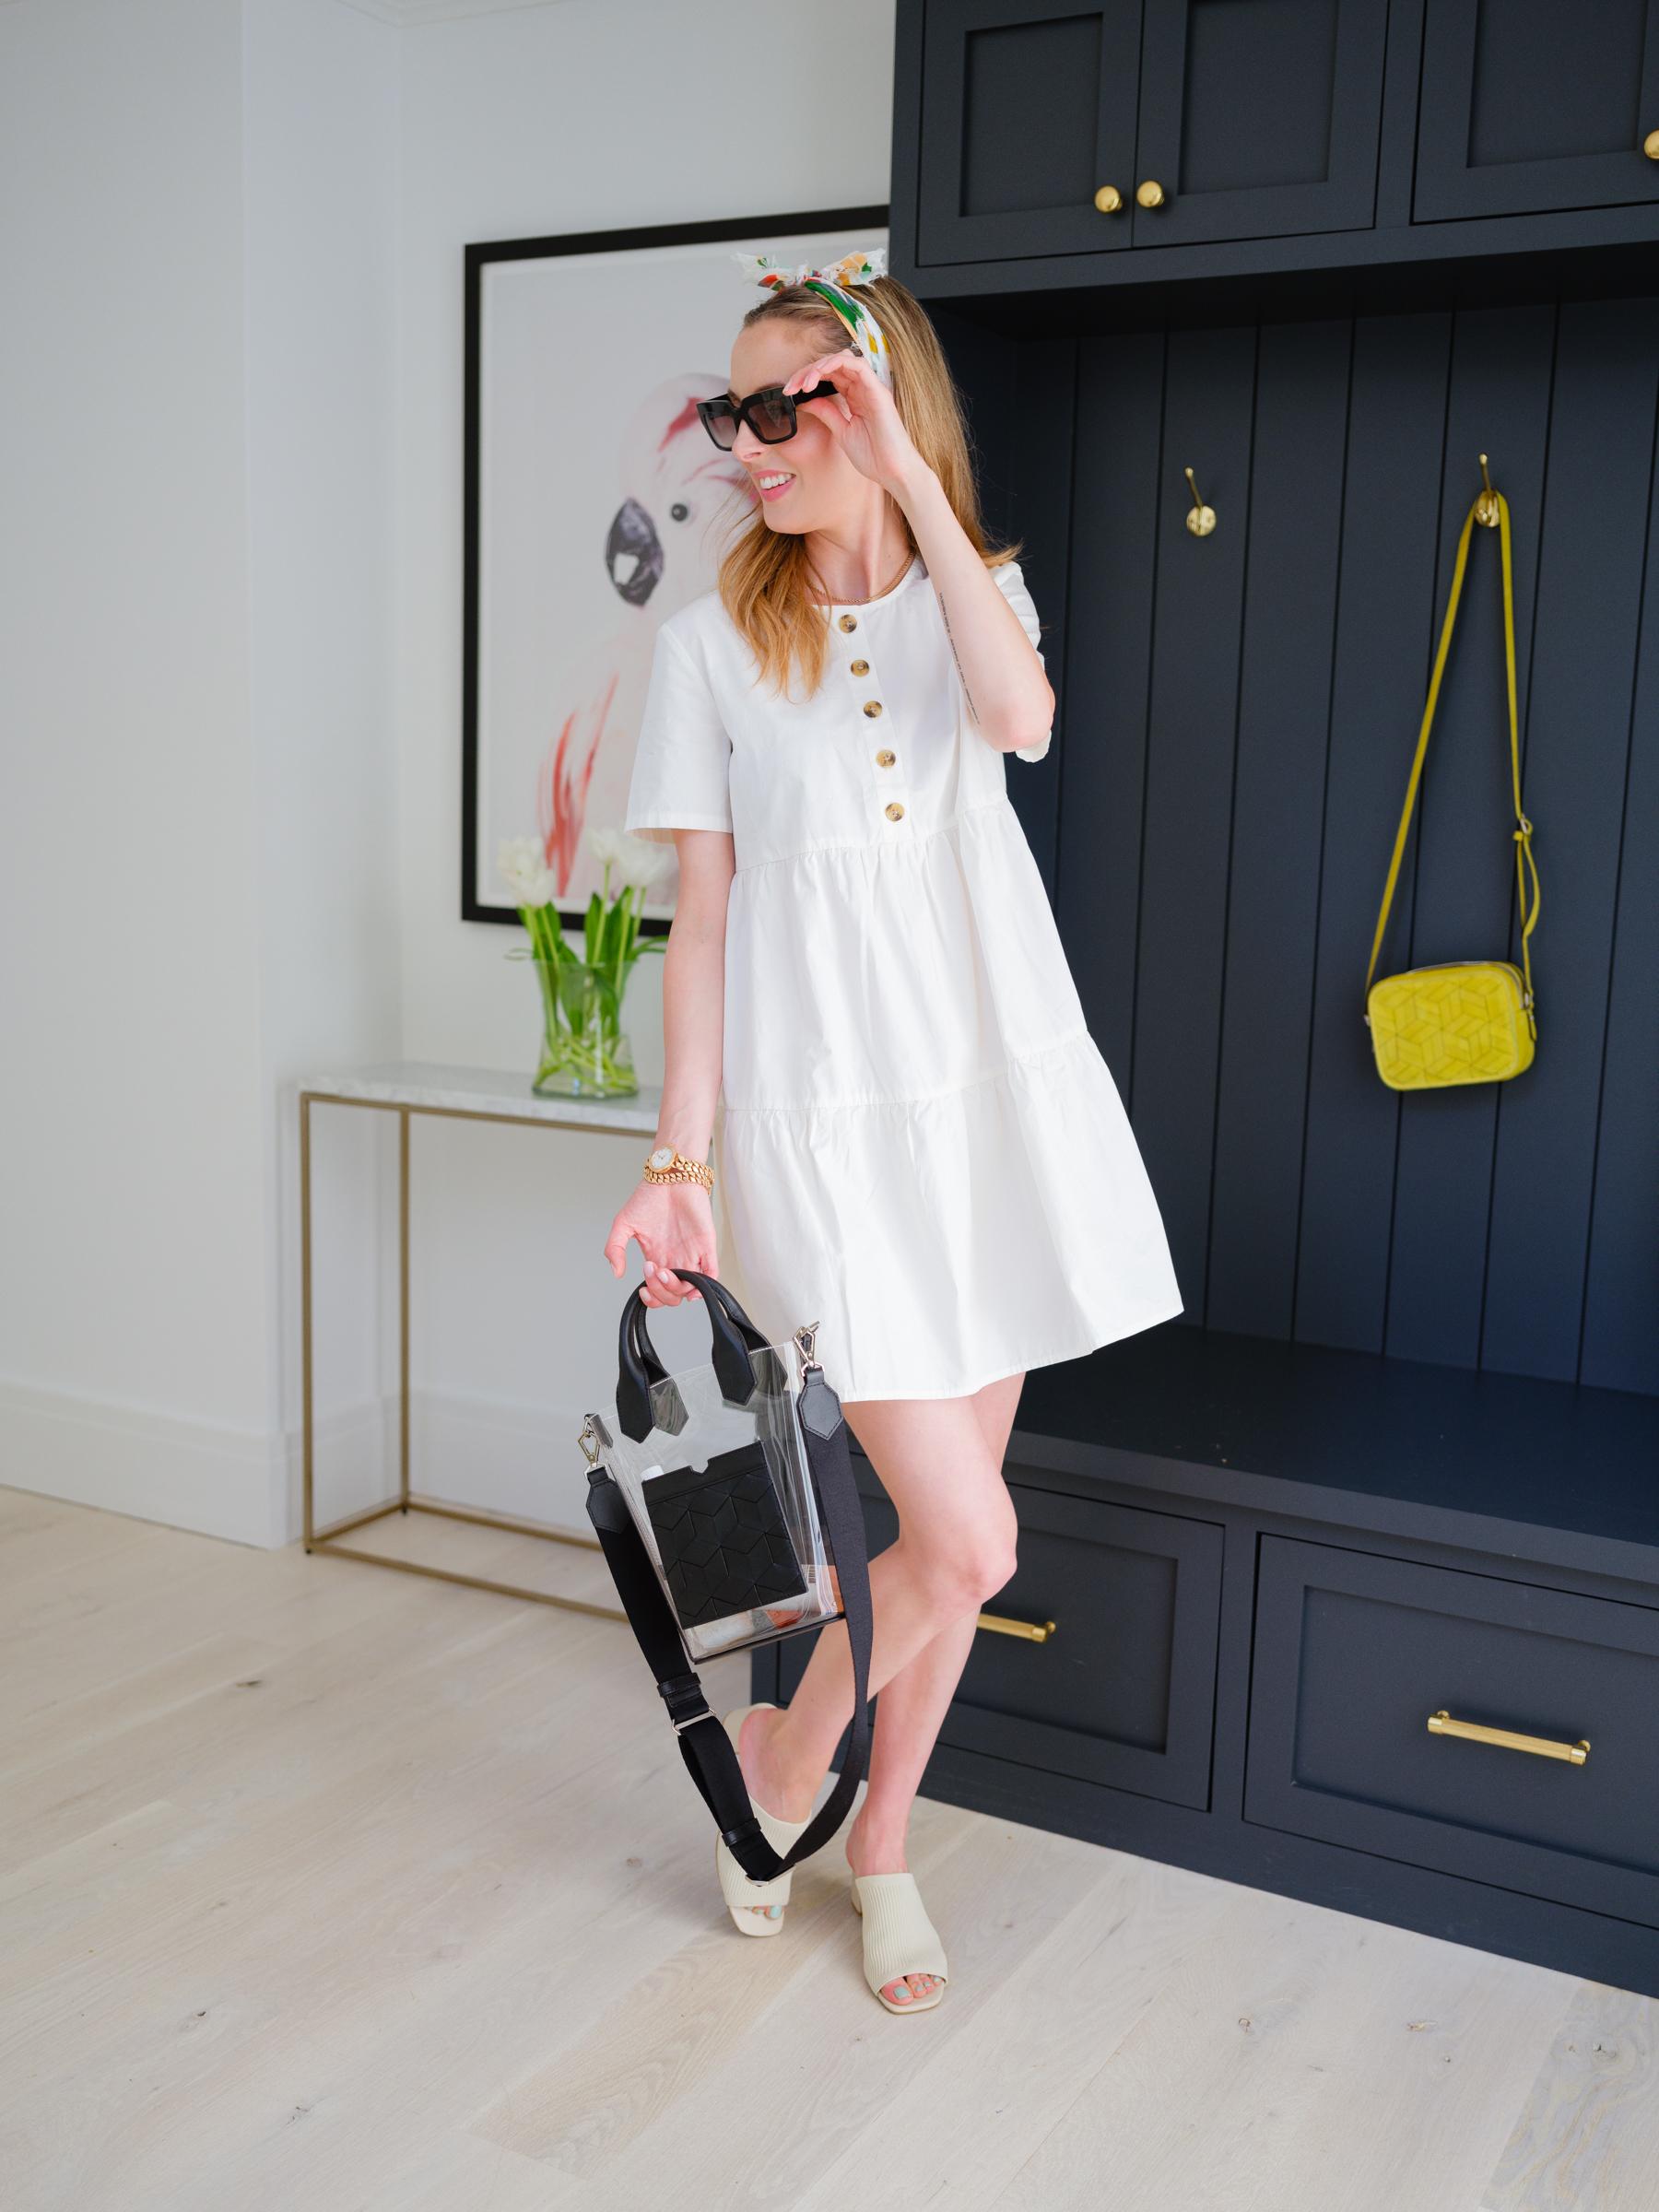 Eva Amurri shares her favorite summer skincare products